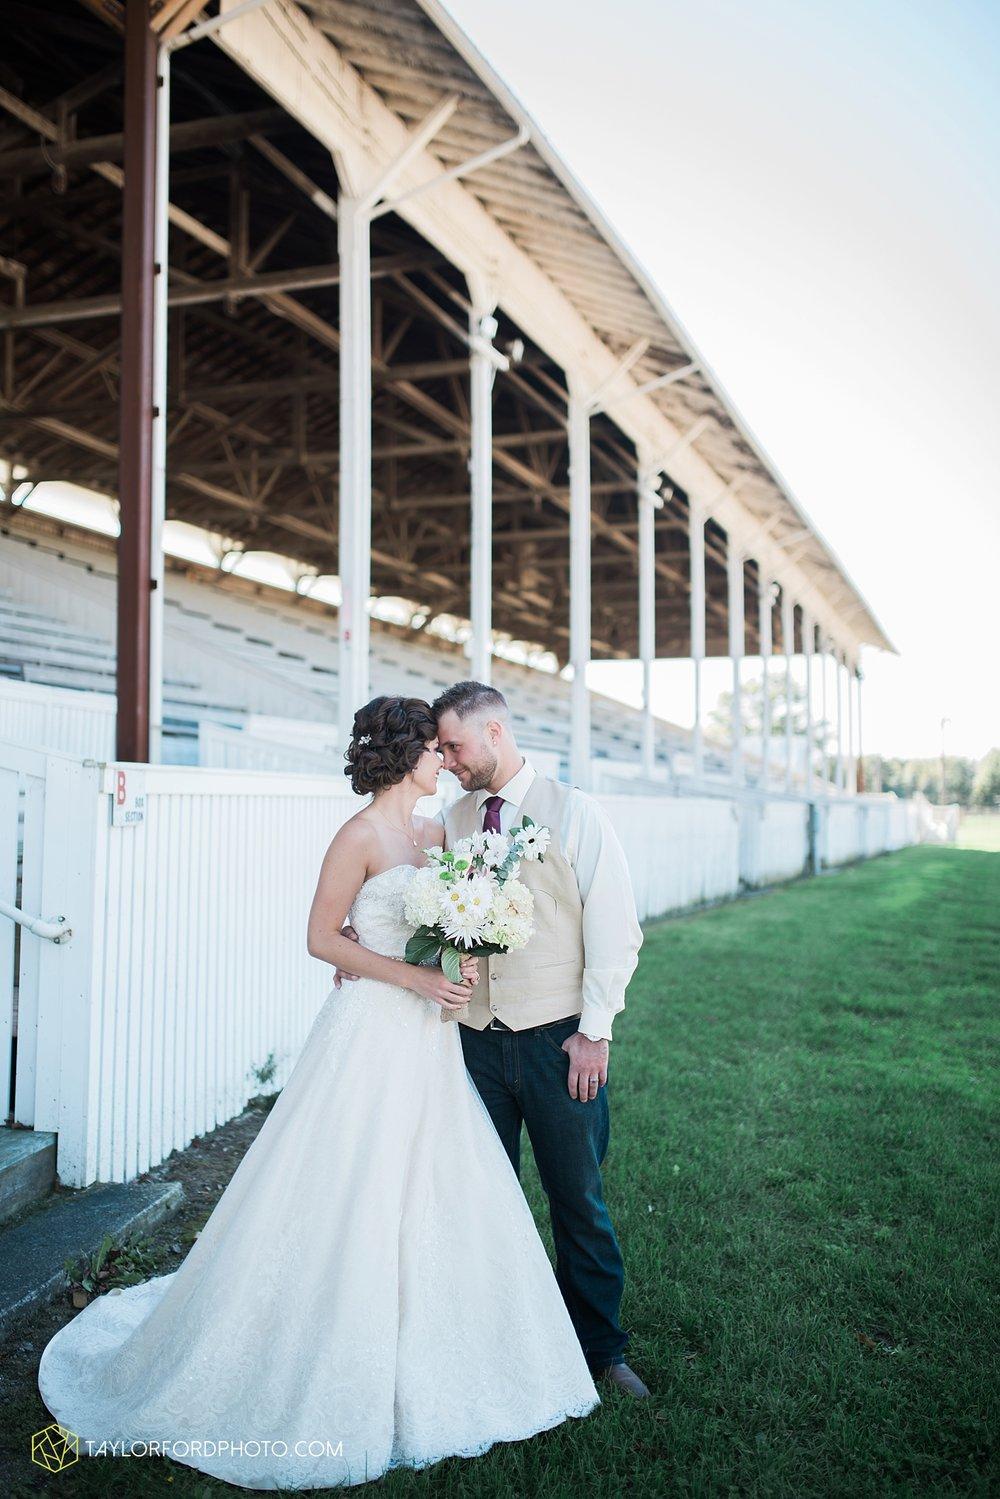 van_wert_ohio_dairy_barn_fairgrounds_fort_wayne_indiana_wedding_photographer_taylor_ford_3268.jpg